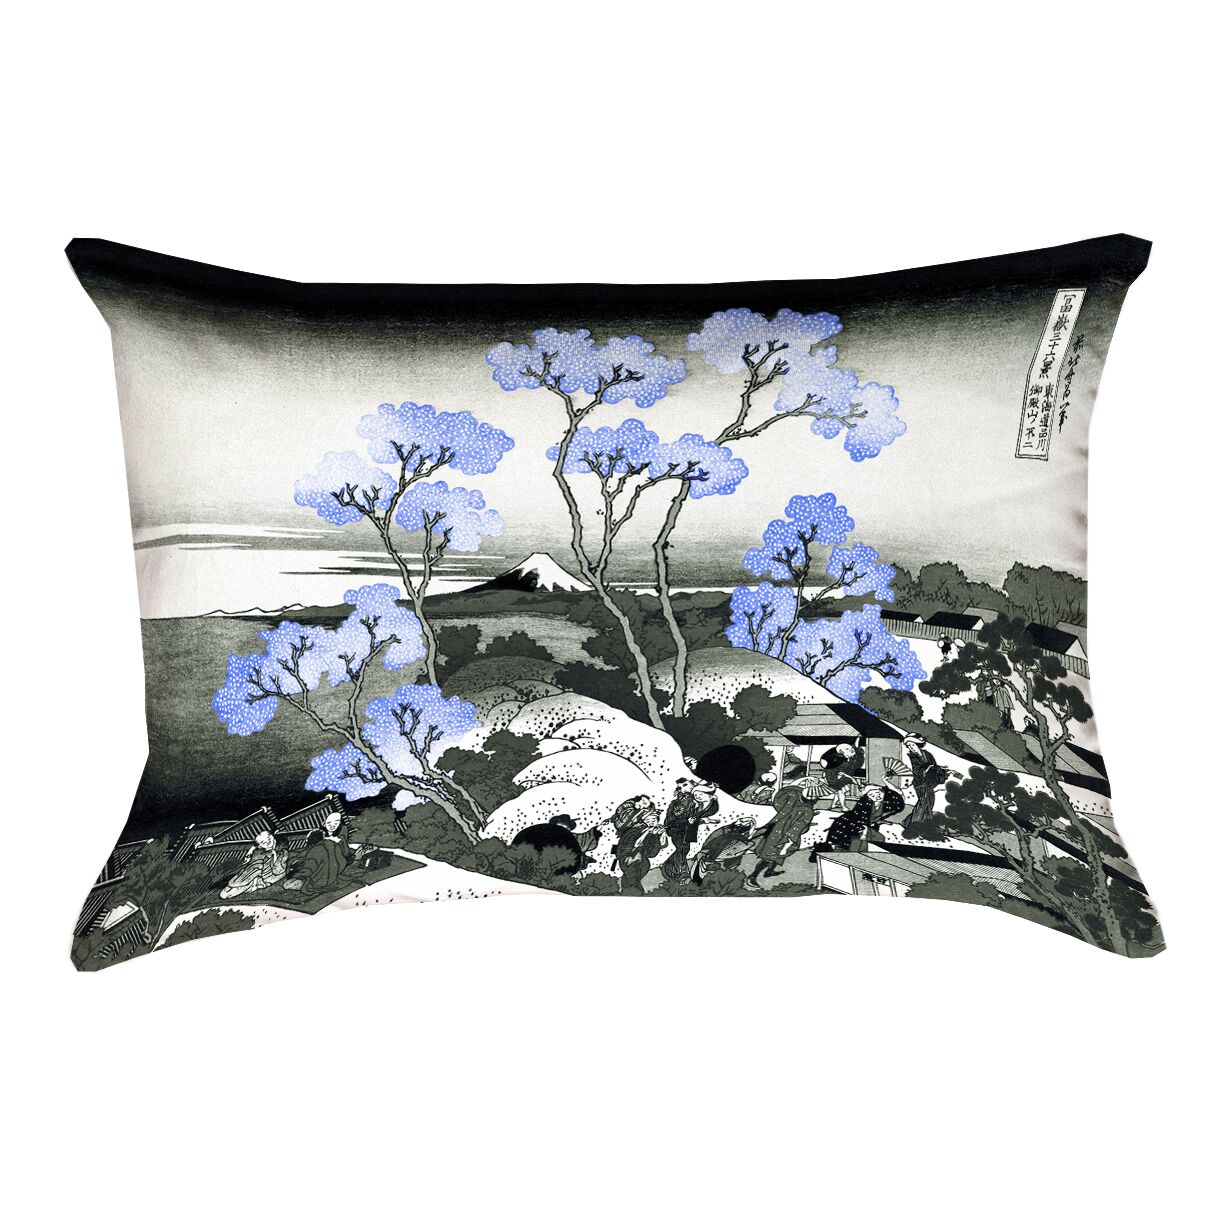 Clair Fuji and Cherry Blossoms Rectangular Pillow Cover Color: Blue